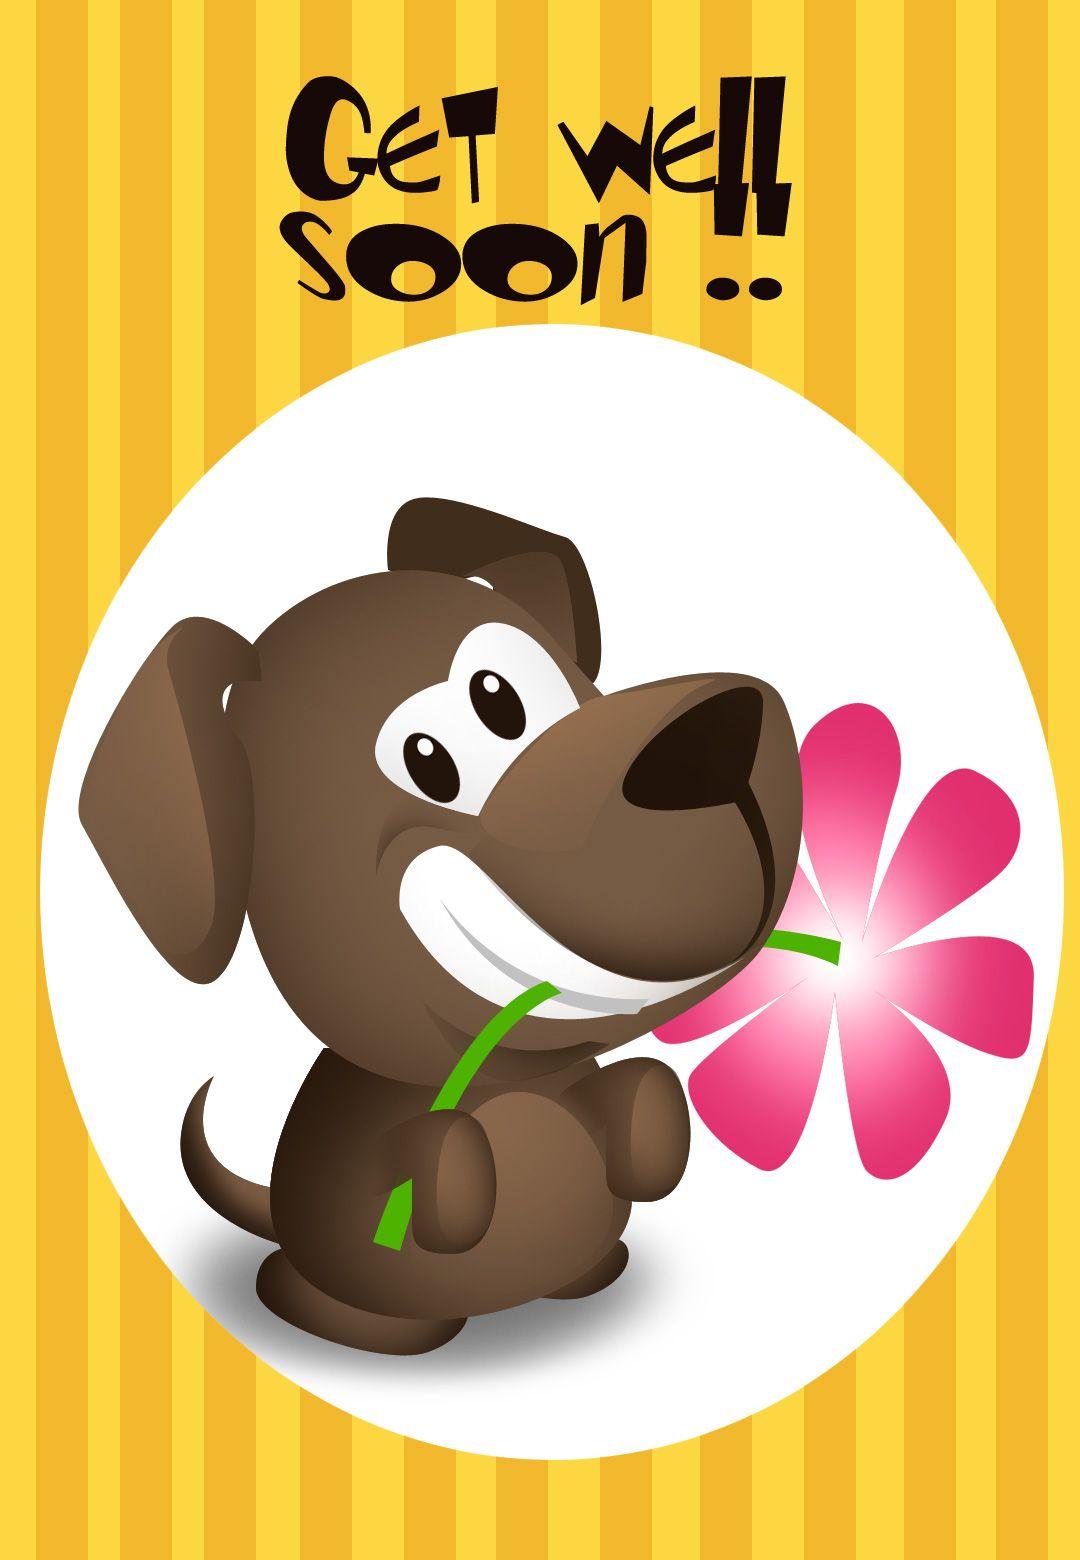 Get Well Soon Free Printable Get Well Soon Puppy Greeting Card - Free Printable Get Well Cards